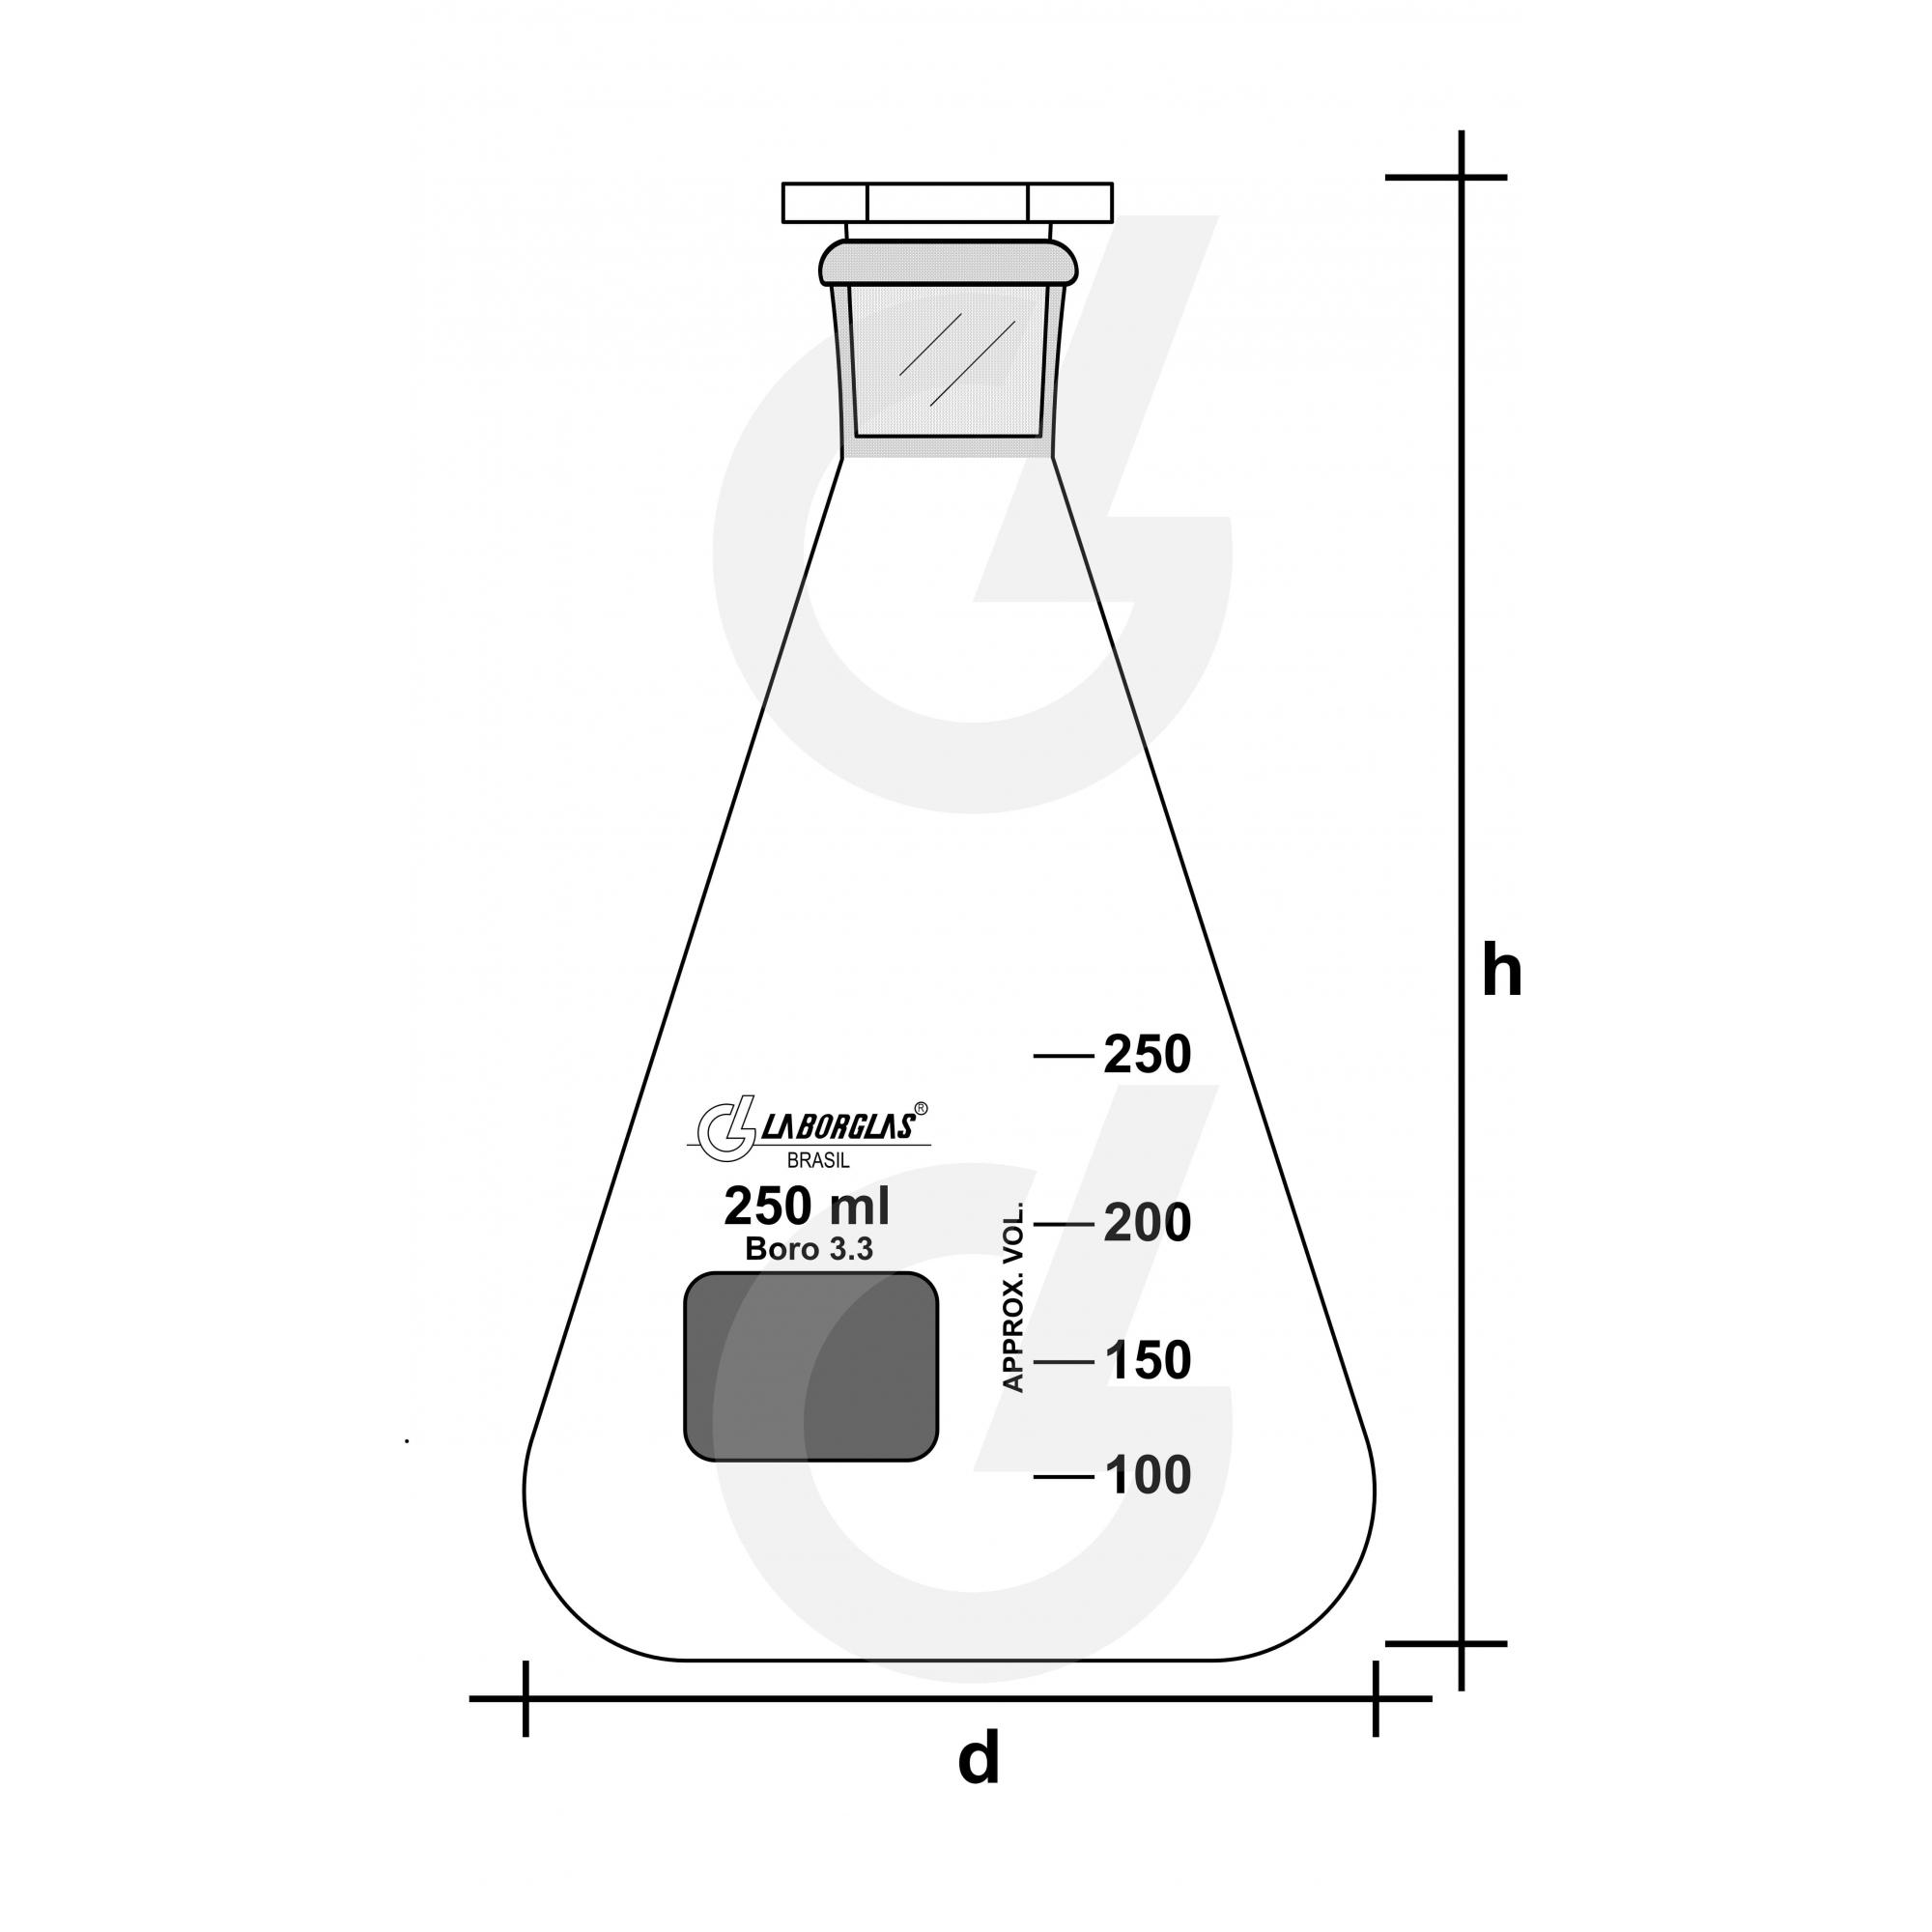 FRASCO ERLENMEYER C/ ROLHA VIDRO 100 ML - Laborglas - Cód. 91216243